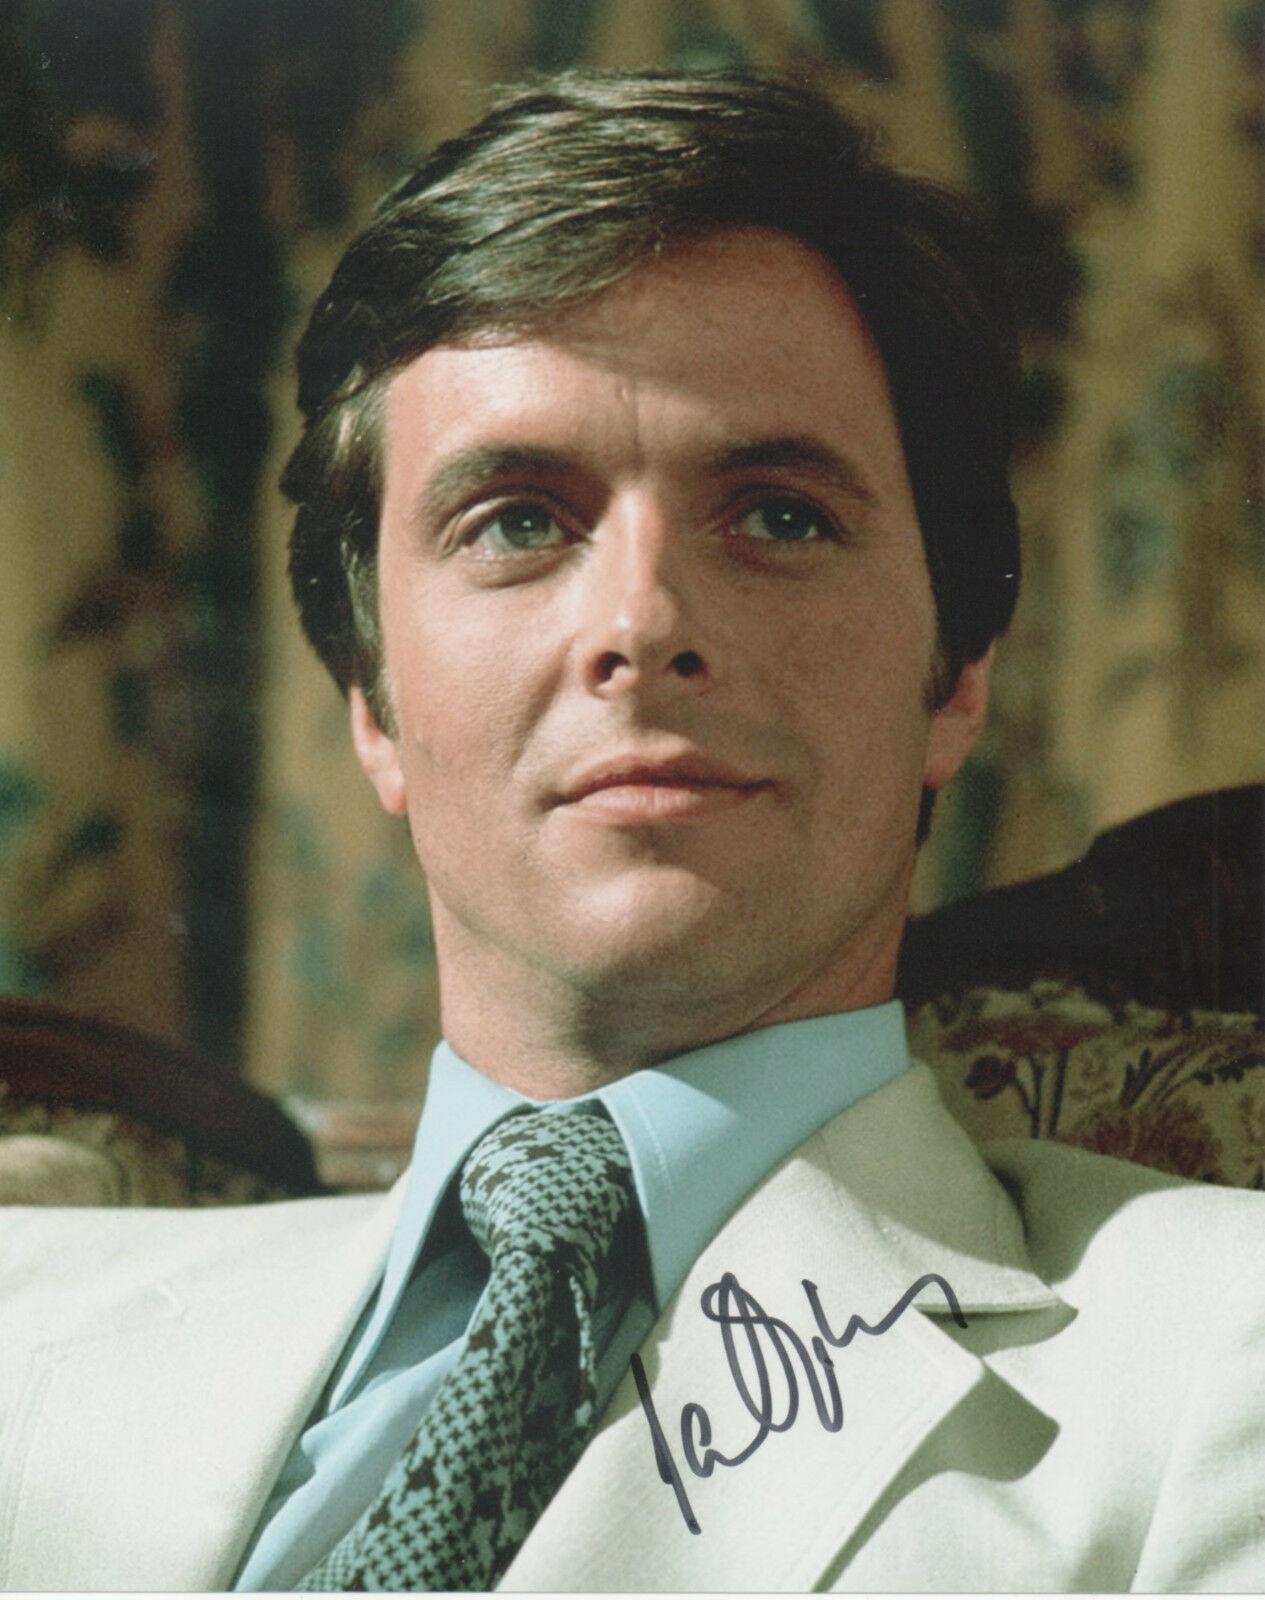 pictures Ian Ogilvy (born 1942)